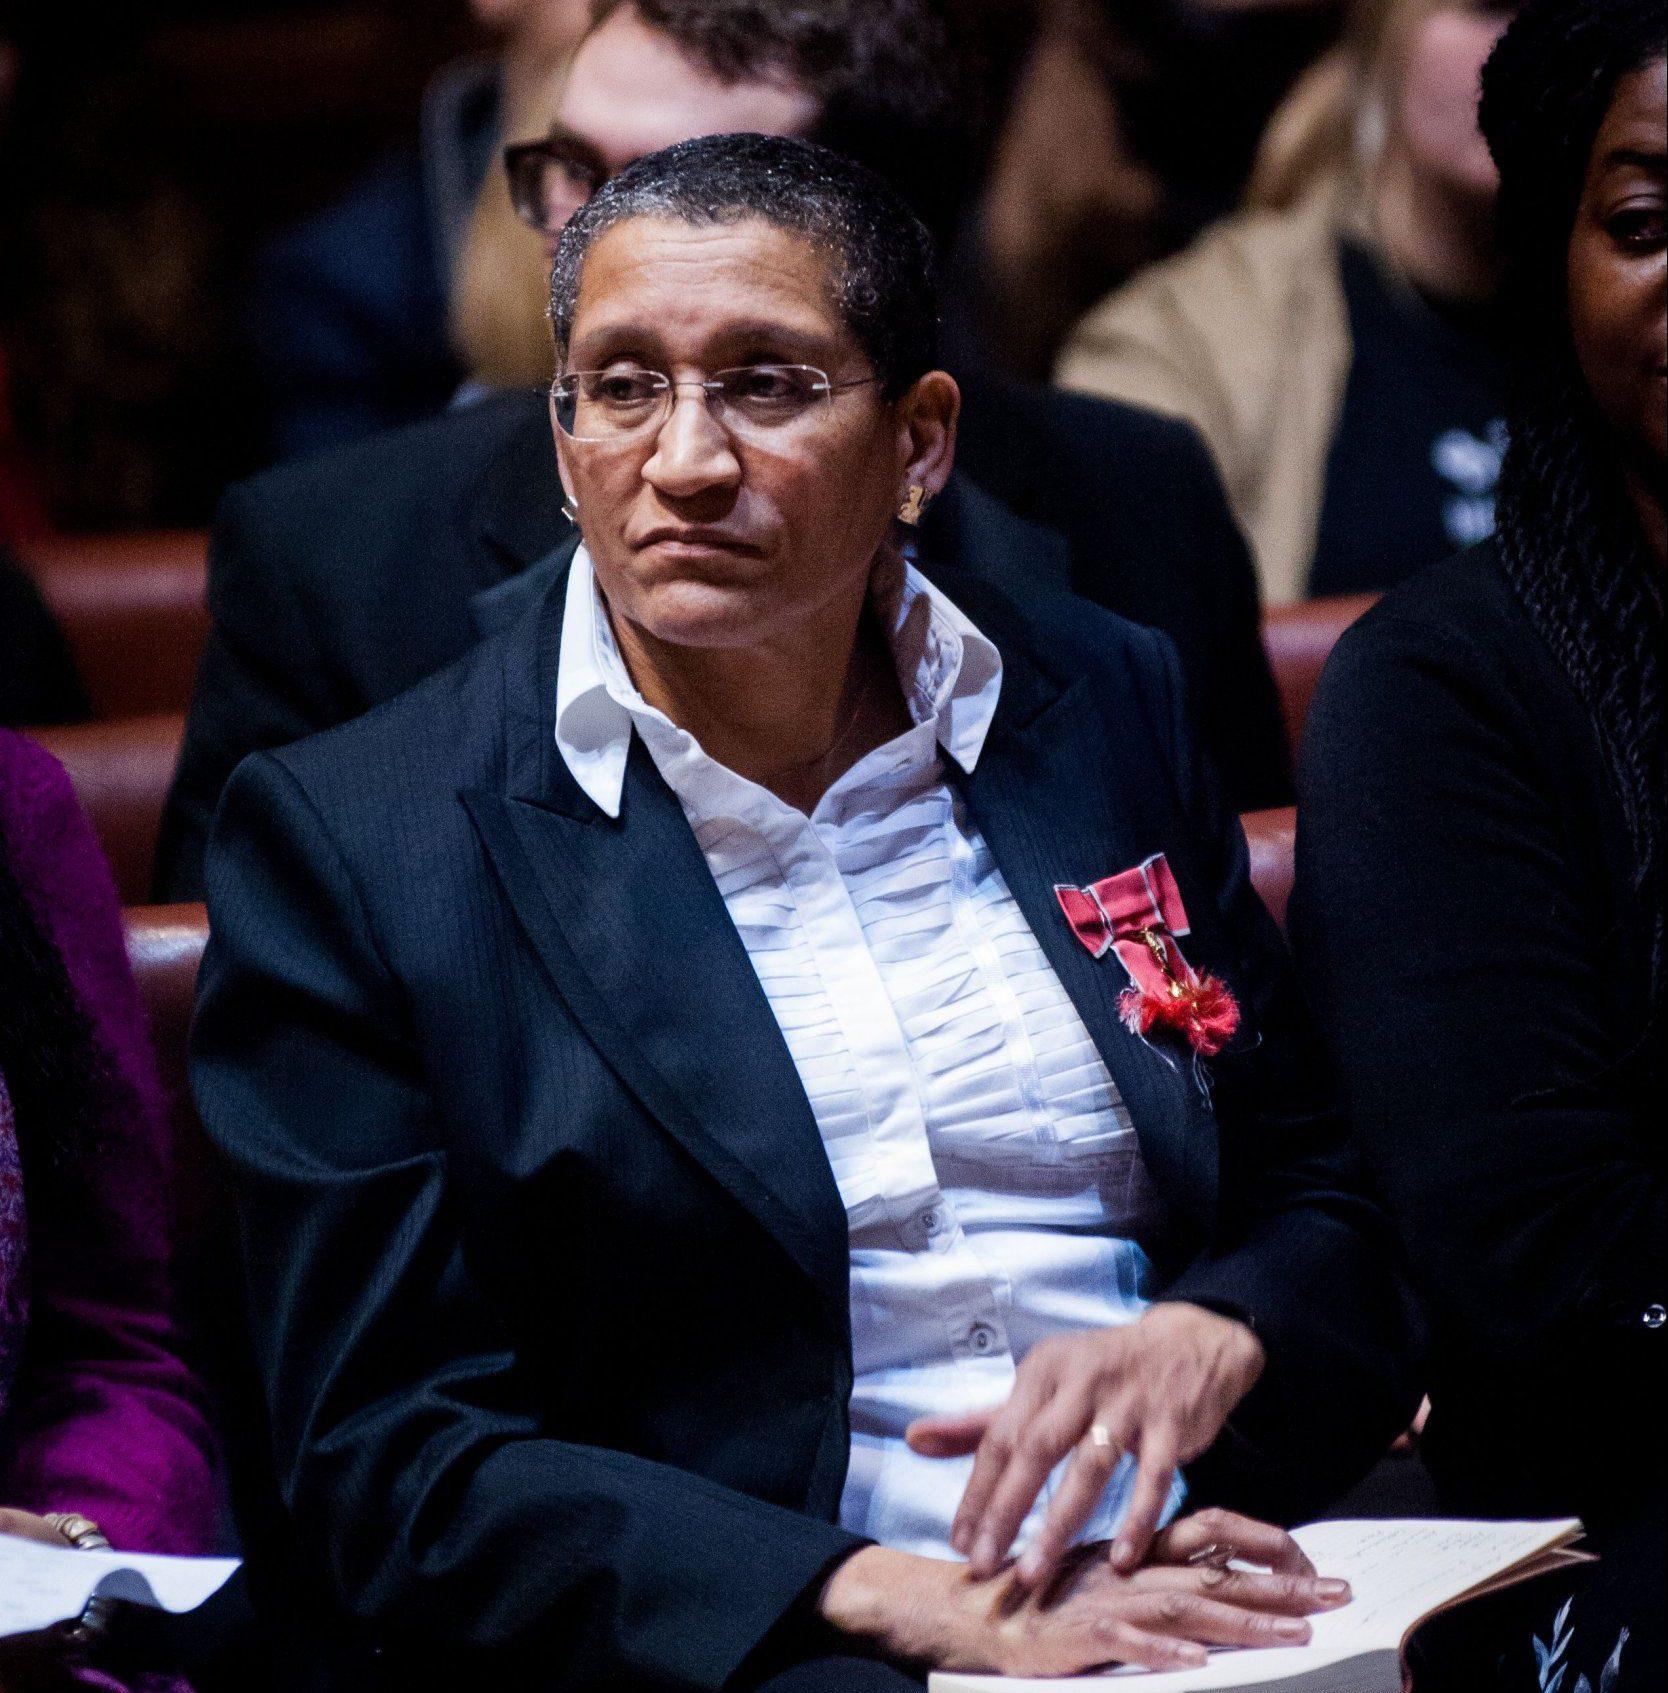 Mandatory Credit: Photo by Roger Askew/REX/Shutterstock (4432636w) Linda Bellos Feminism Debate at the Oxford Union, Britain - 12 Feb 2015